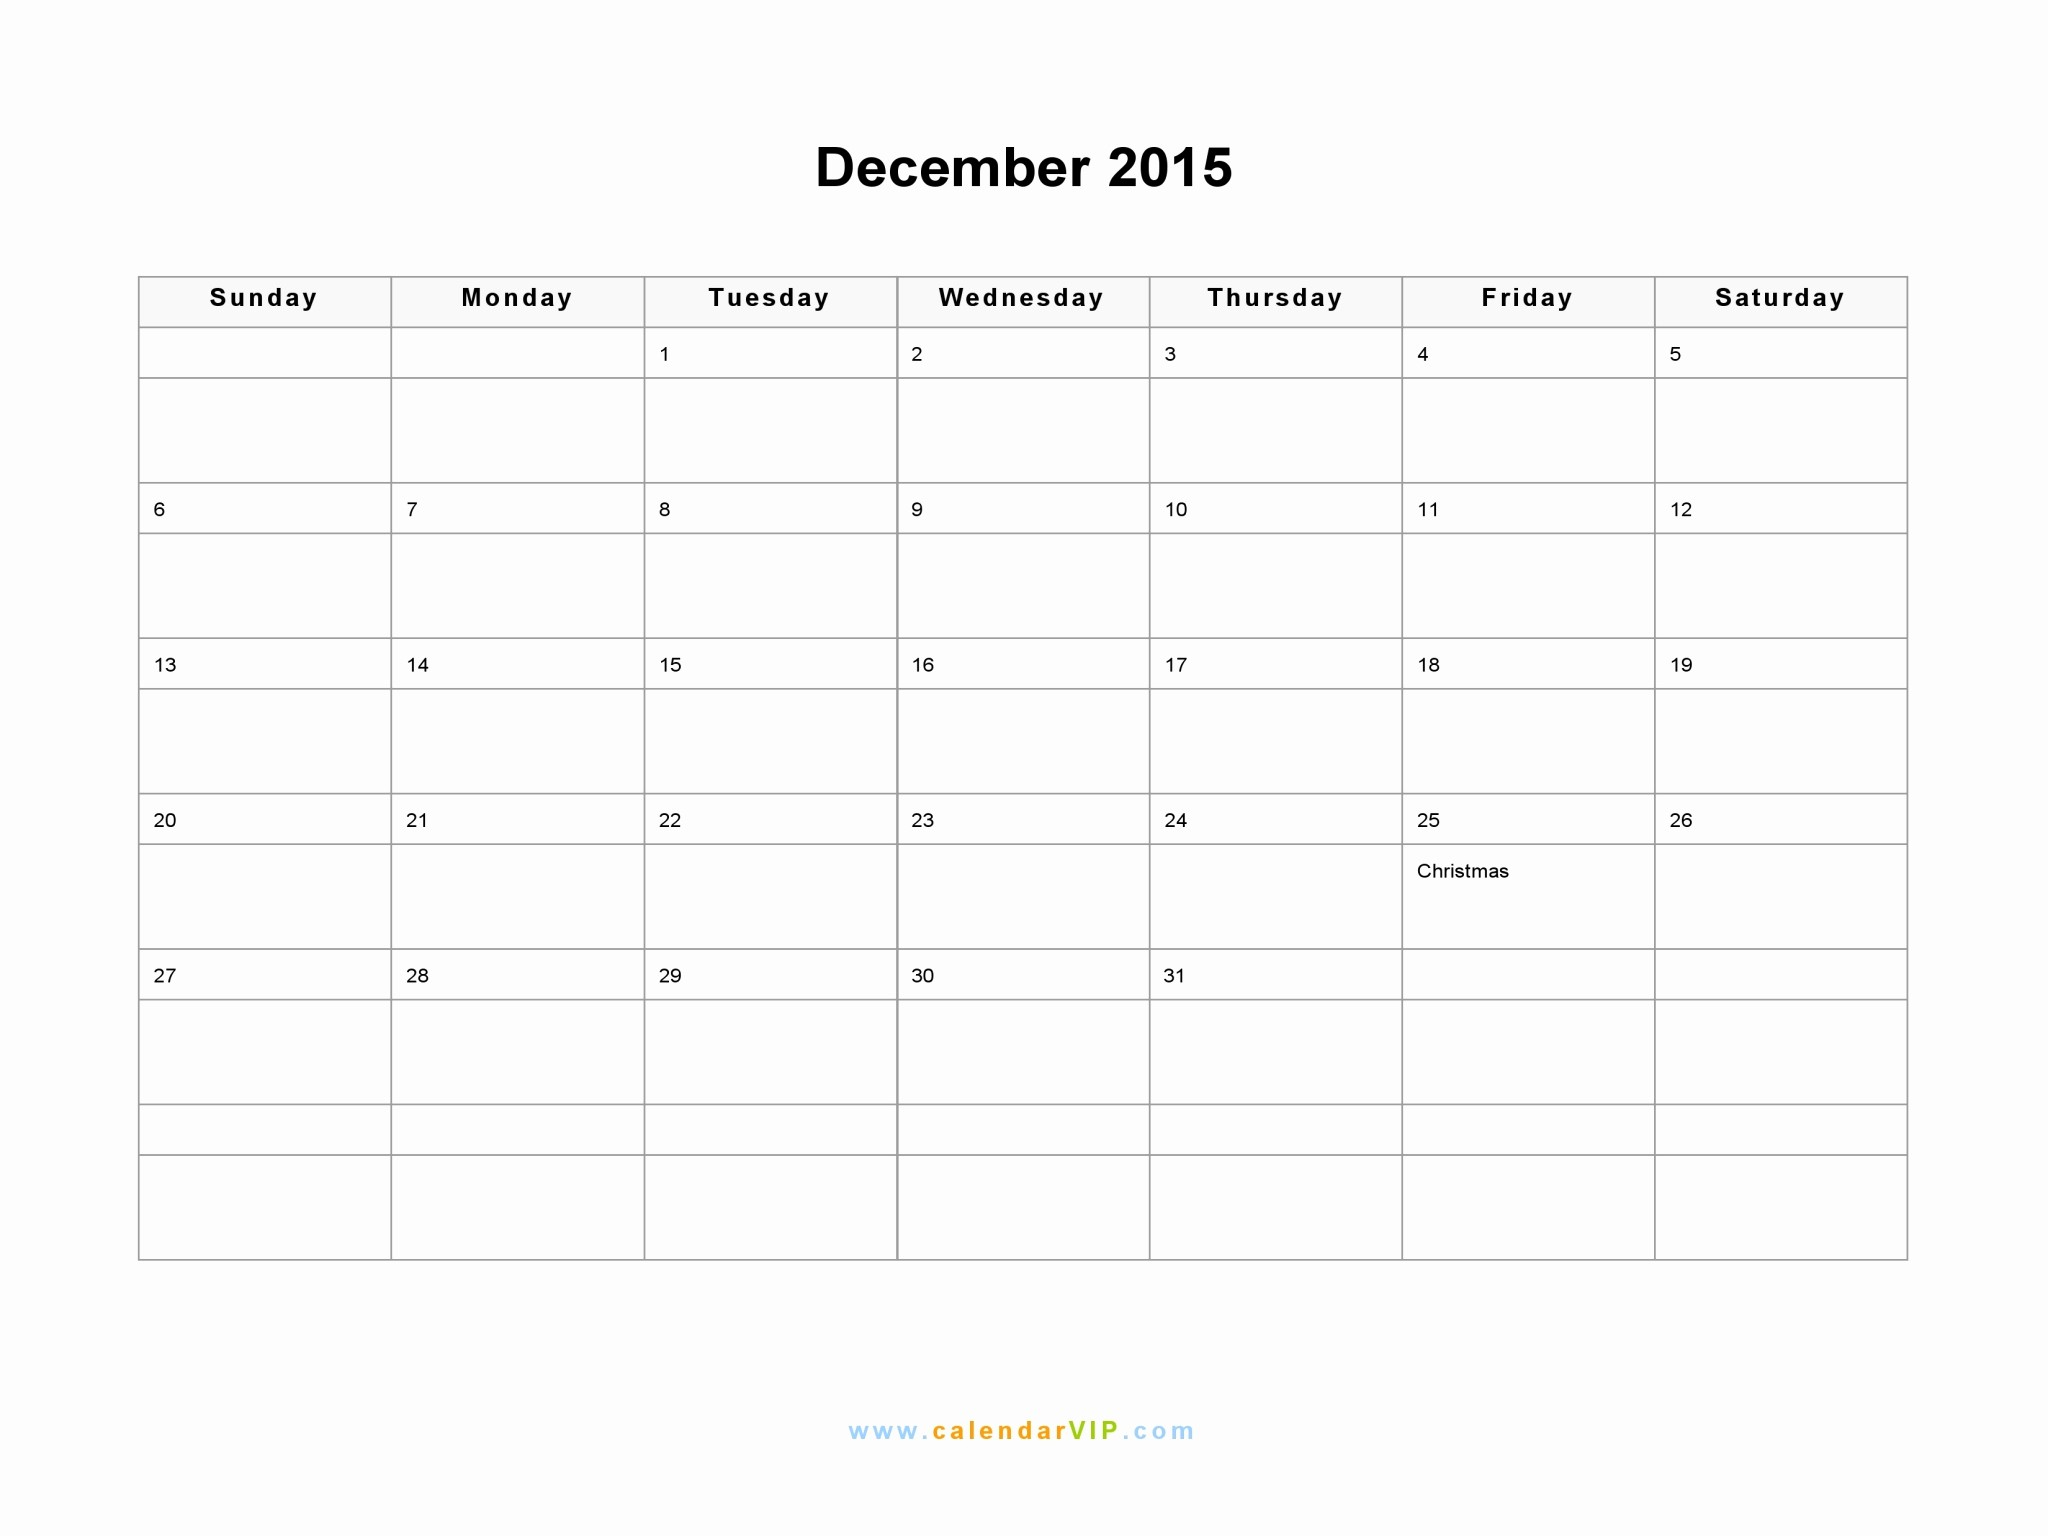 December 2015 Calendar Word Document Unique December 2015 Calendar Blank Printable Calendar Template